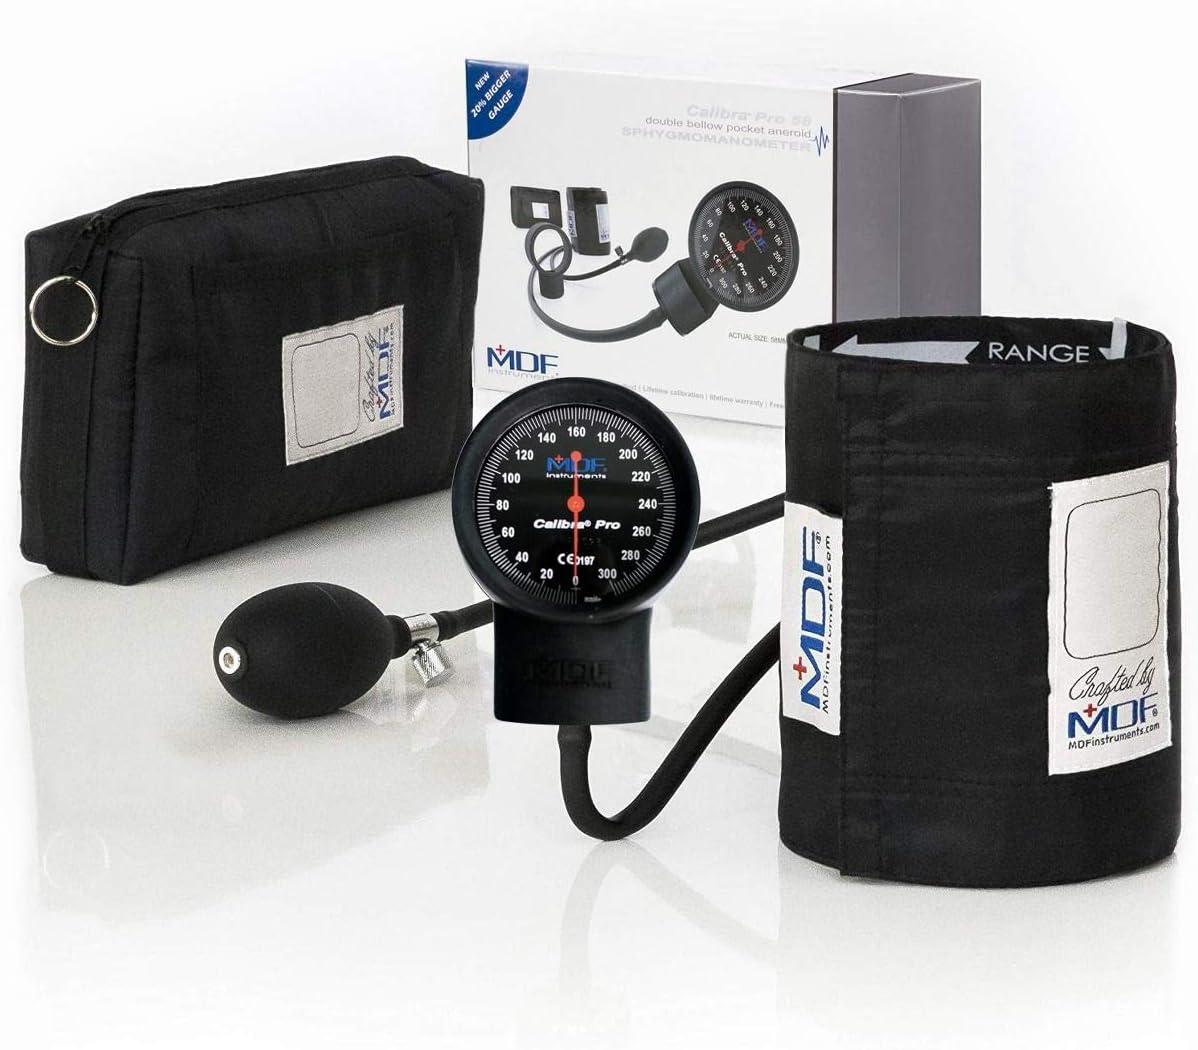 Amazon.com: MDF Calibra Pro Aneroid Sphygmomanometer ...